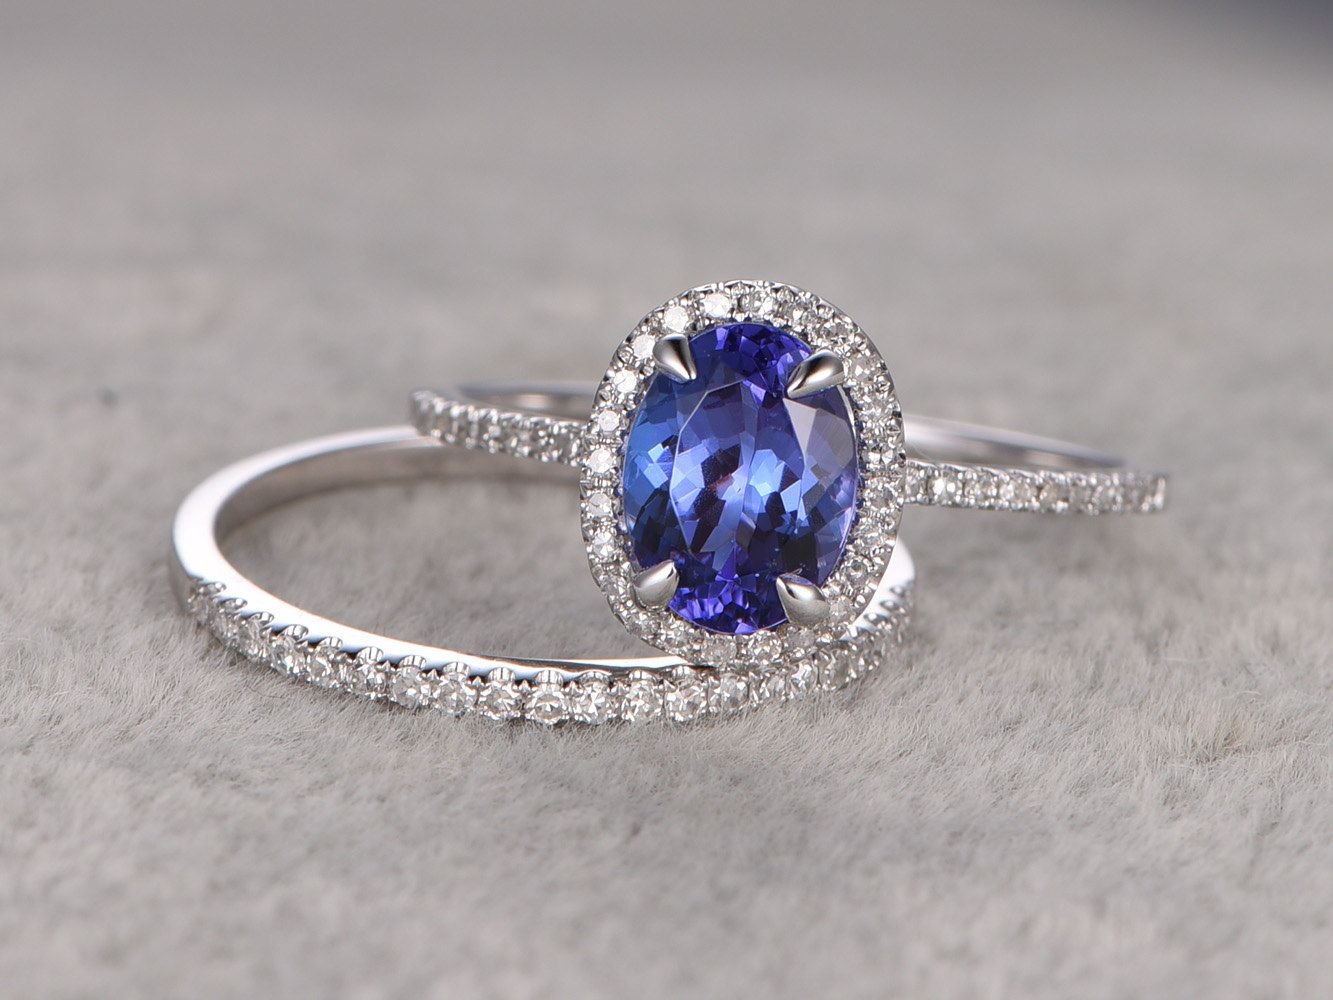 tanzanite jewelry tanzanite wedding rings 1 28ctw Oval Tanzanite Engagement ring VS Diamond Promise Ring 14K White Gold